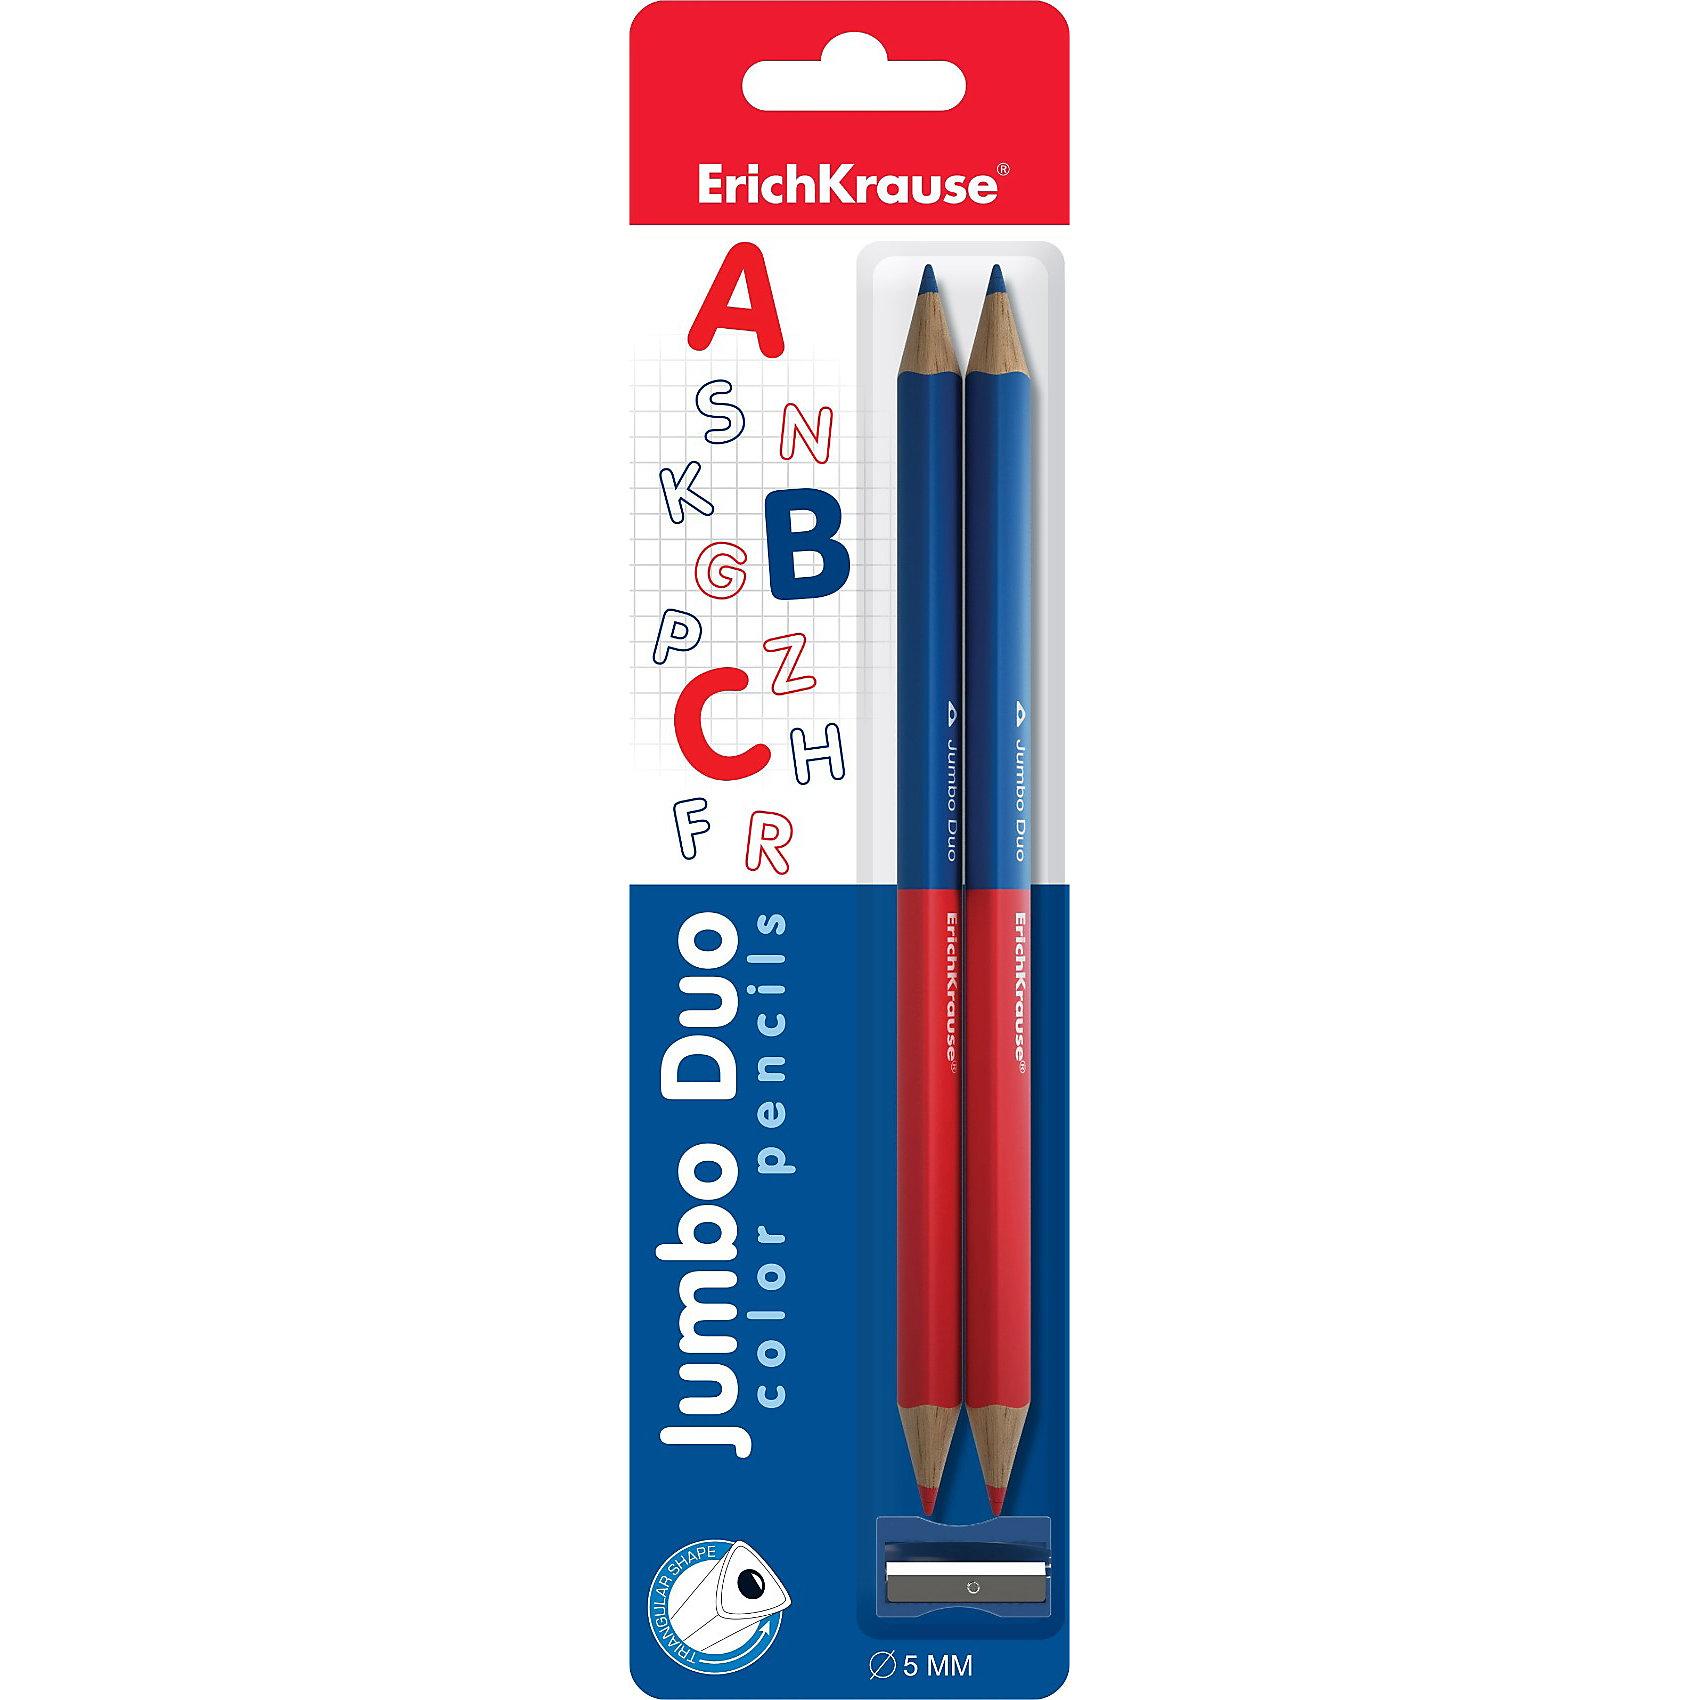 ErichKrause Двухцветные треугольные карандаши JUMBO c точилкой erichkrause цветные карандаши 12цв треугольн с точилкой 3 раскраски artberry jumbo